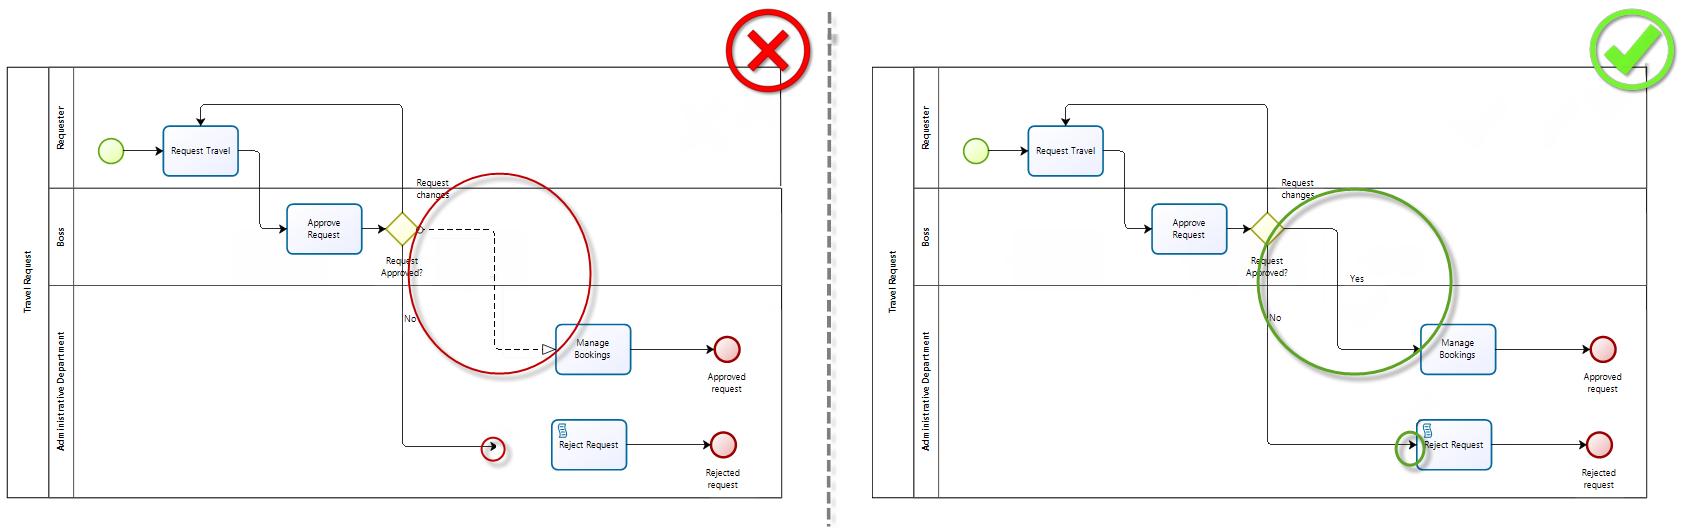 Bizagi Studio Best Practices And Implementation Guidelines Process Flow Diagram Optional Steps Bestpractices12